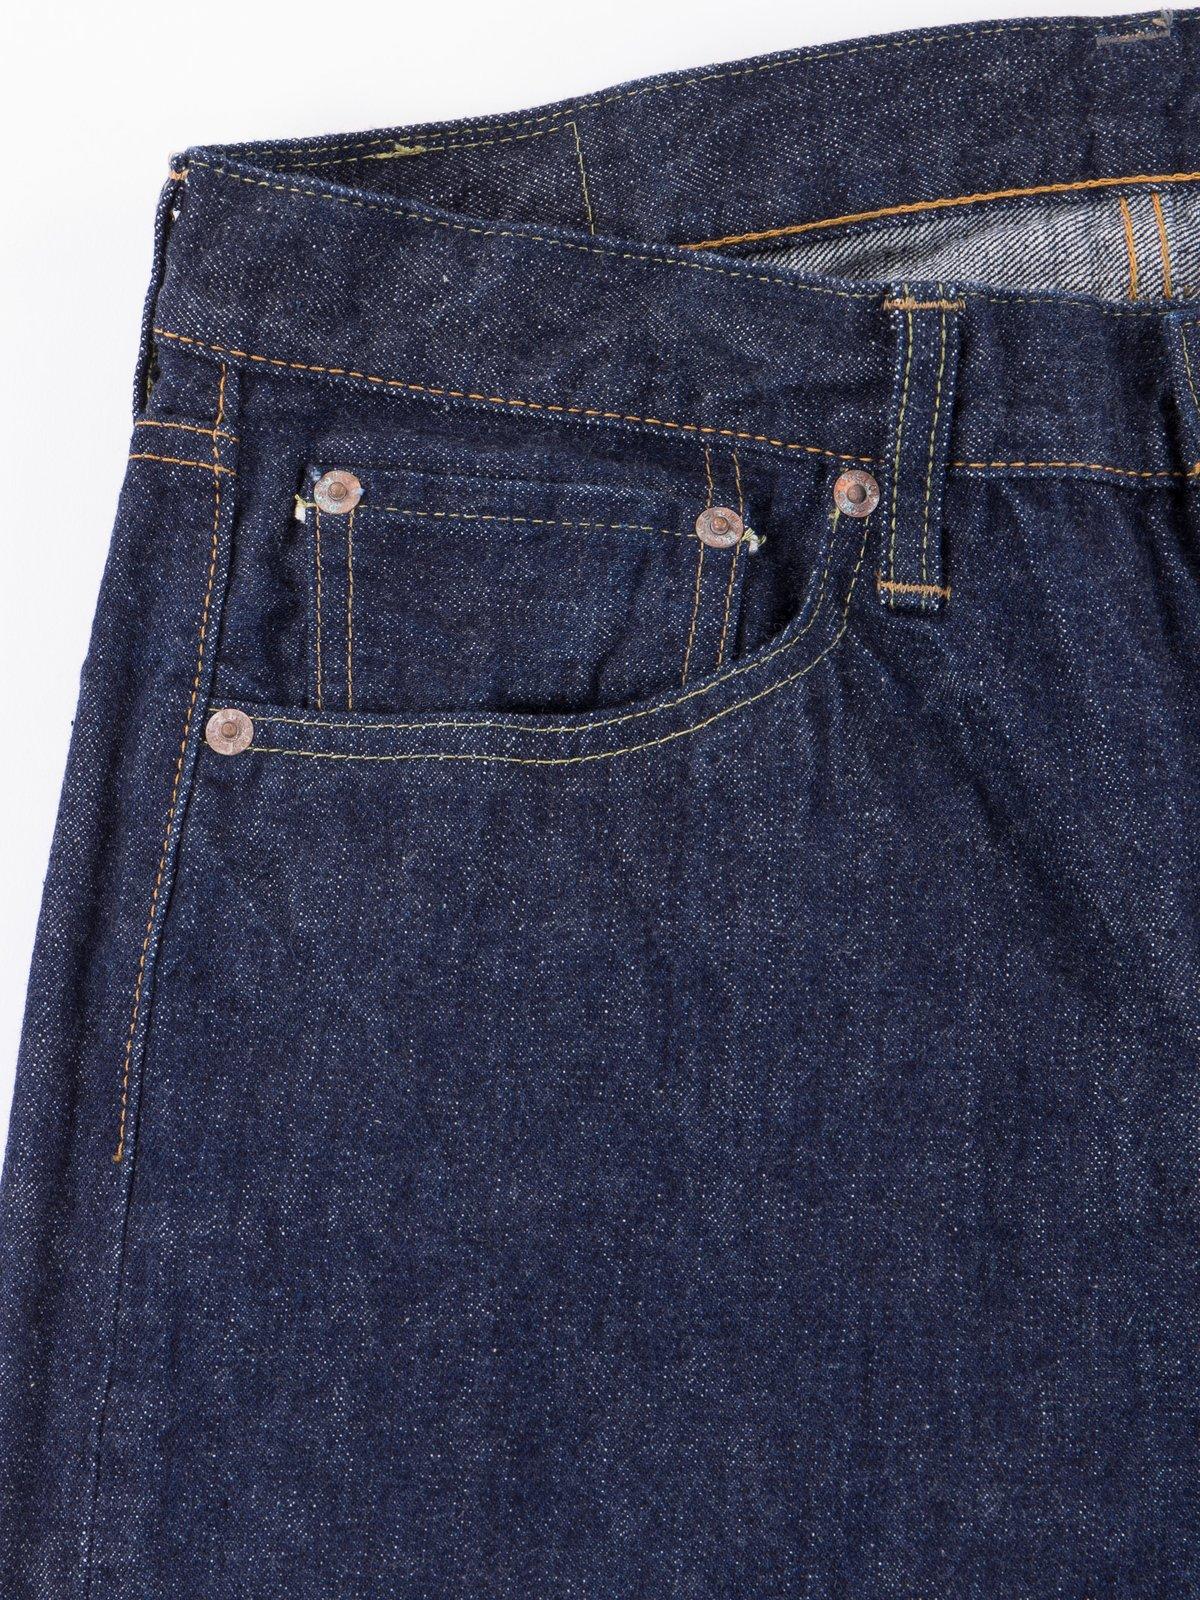 One Wash 107 Slim Fit Jean - Image 2